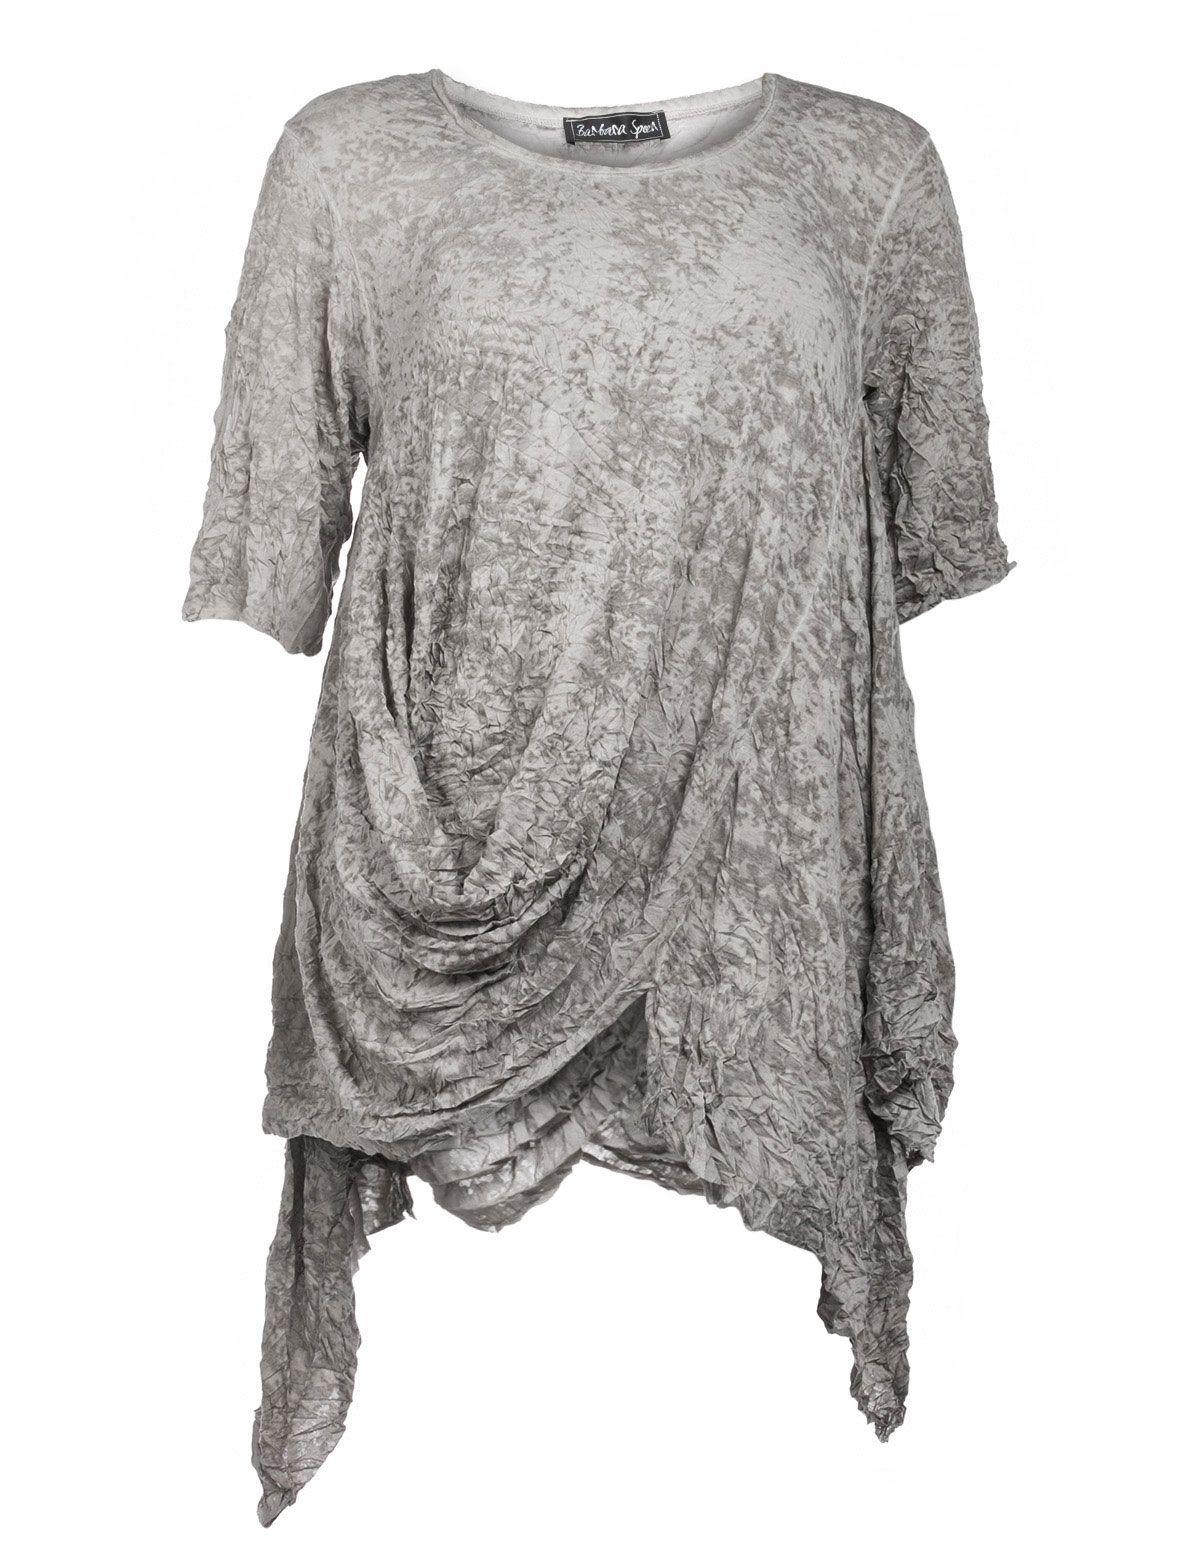 Barbara Speer Shirt Mit Geraffter Front In Taupe Grau